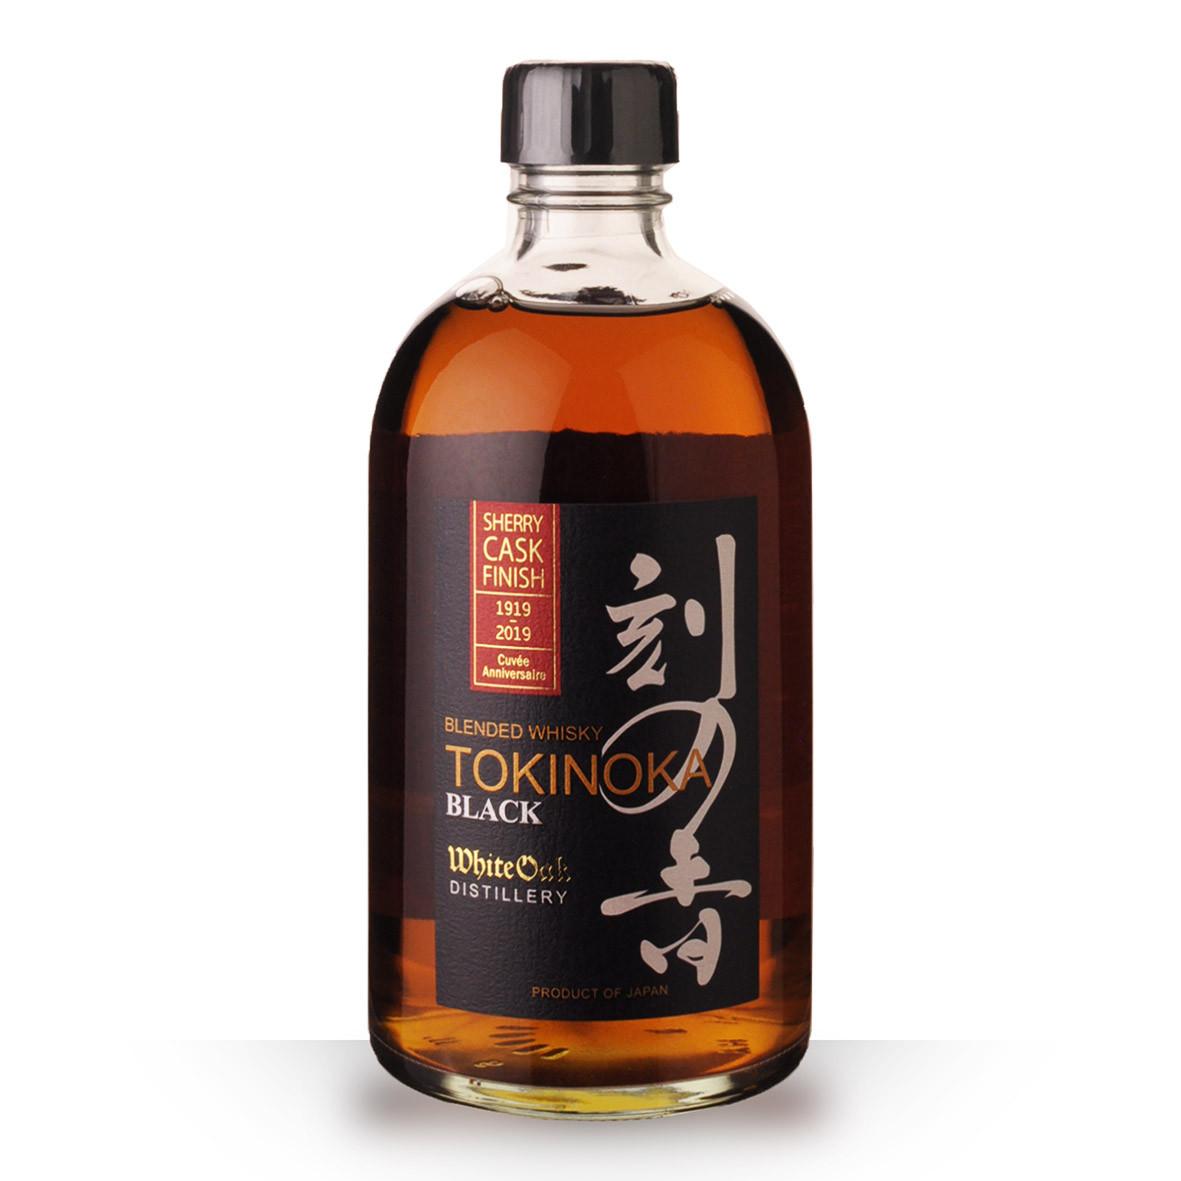 Whisky Tokinoka Black Sherry Finish 50cl Etui www.odyssee-vins.com